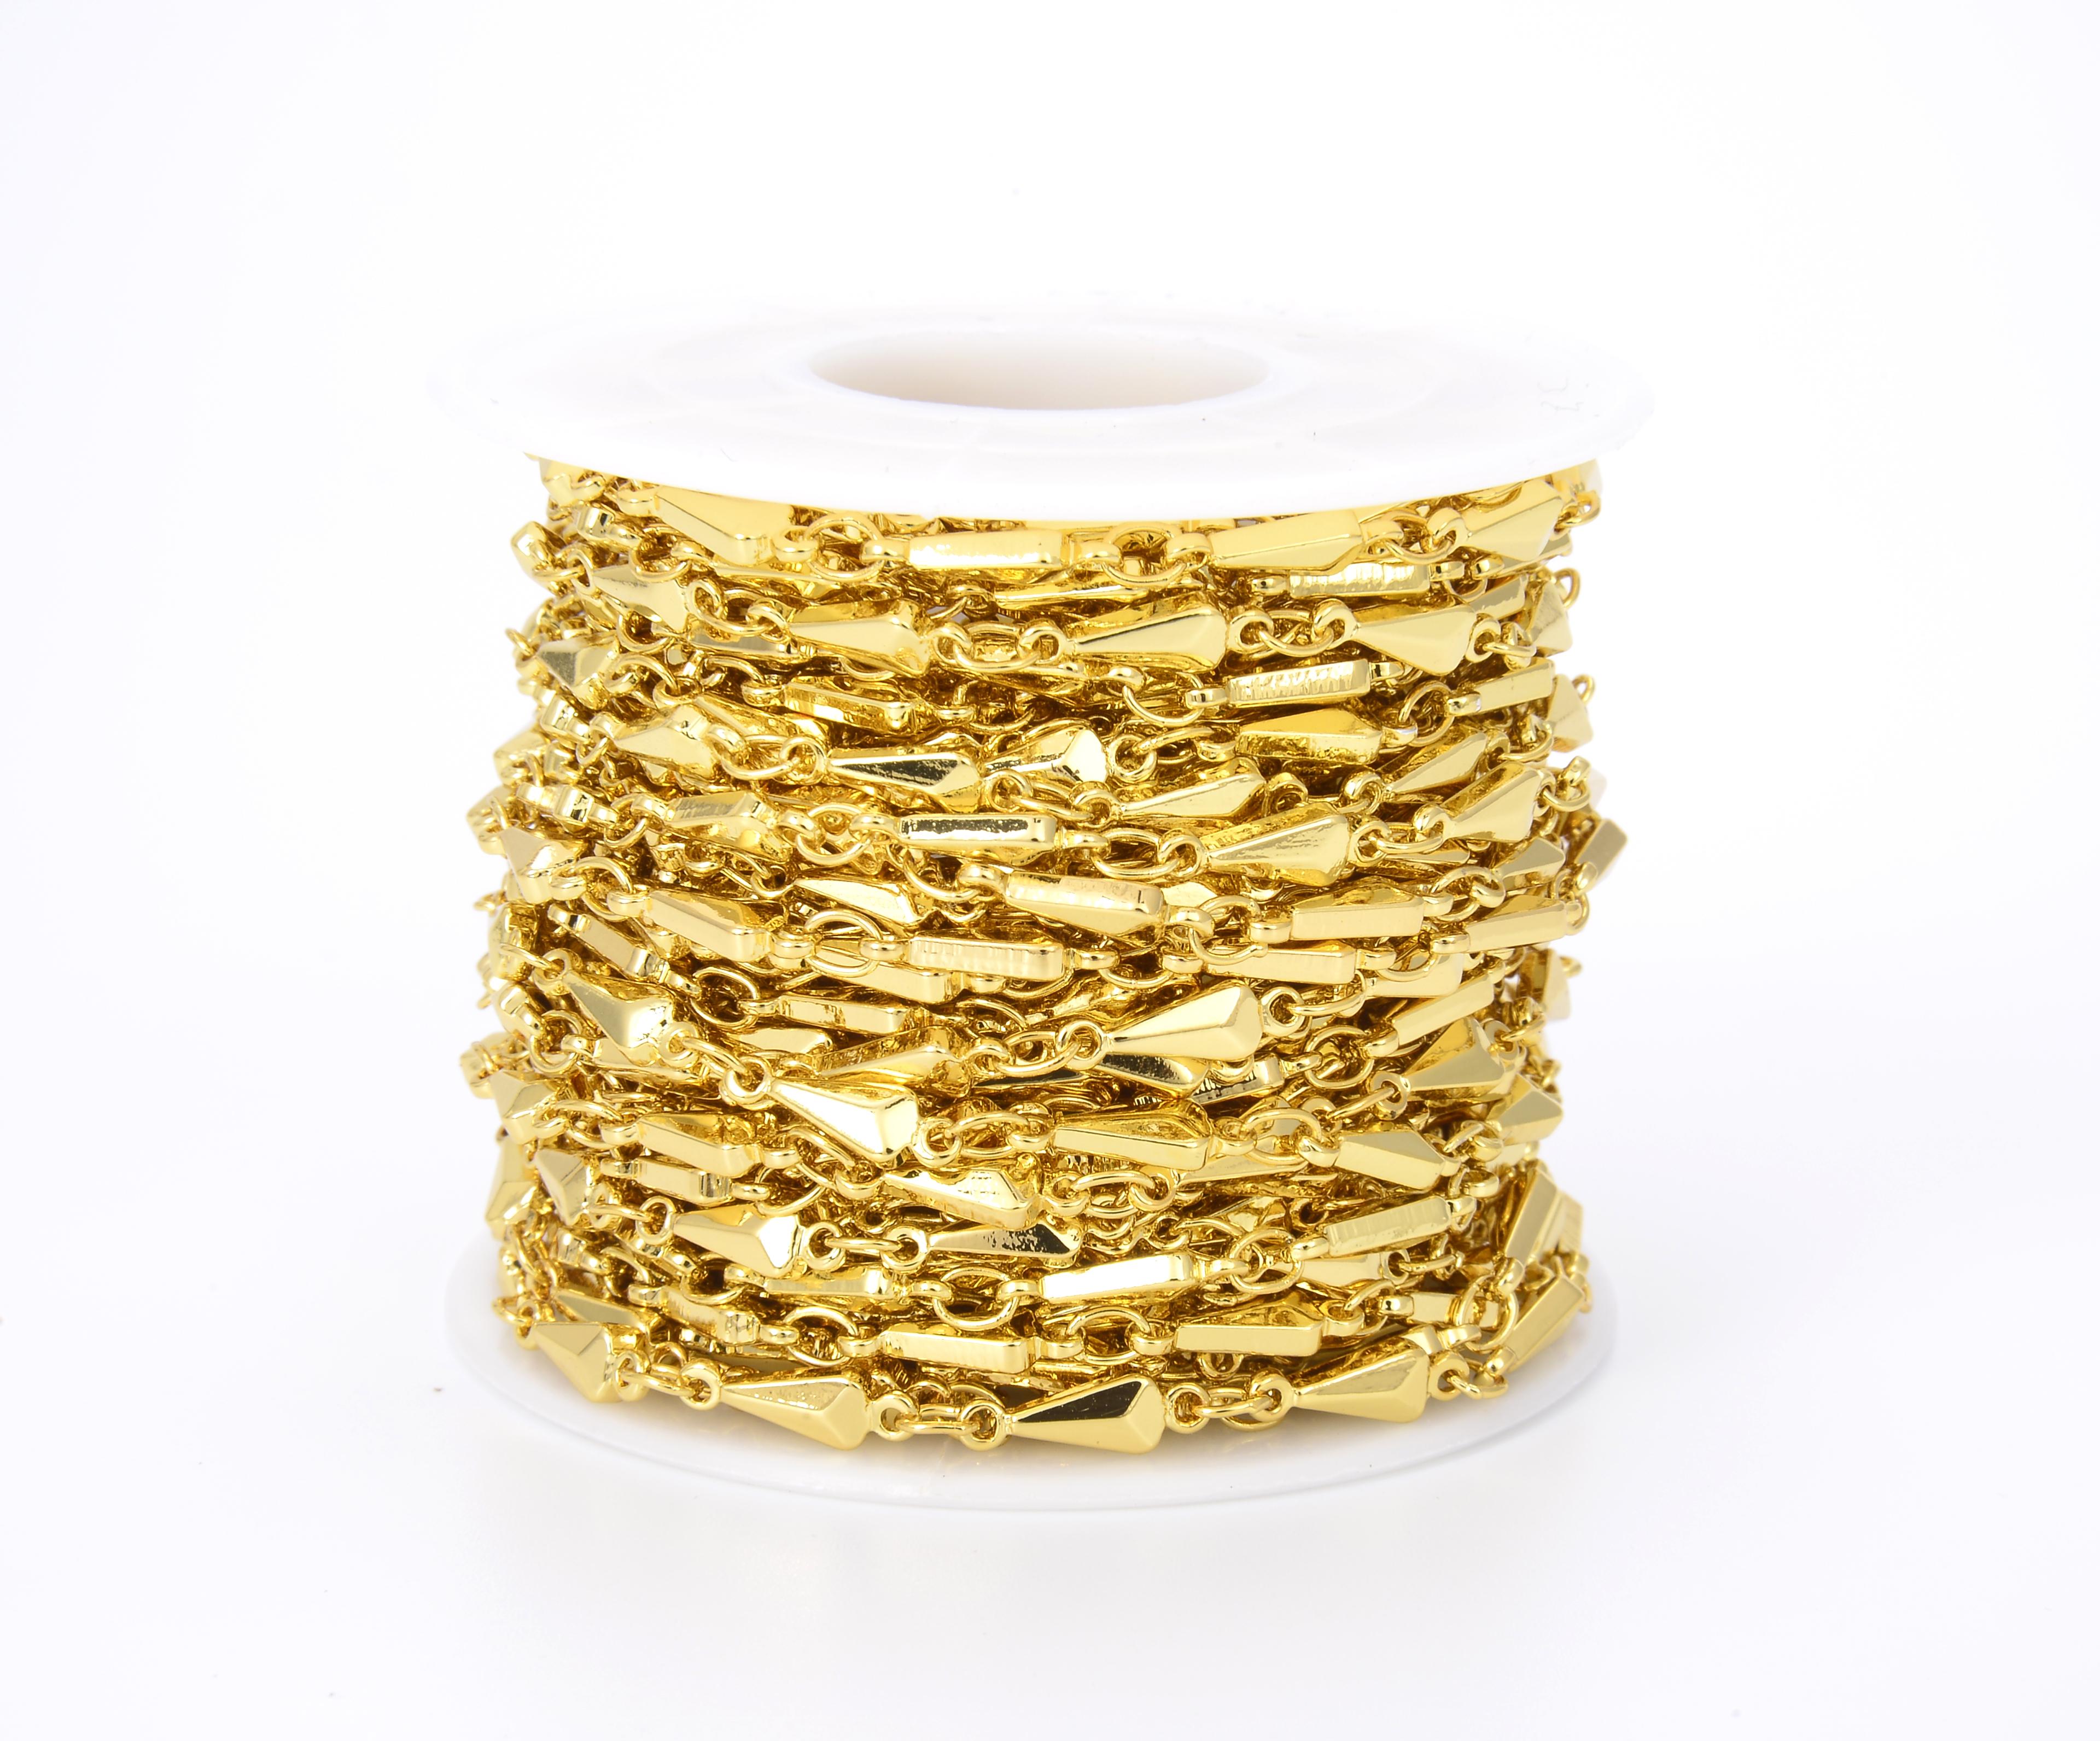 11x3mm Spike Chain 18K Gold Filled 1310 Feet Gold Triangle Beaded Chain CH080 Bulk Chain Arrowhead Beaded Chain Beaded Chain